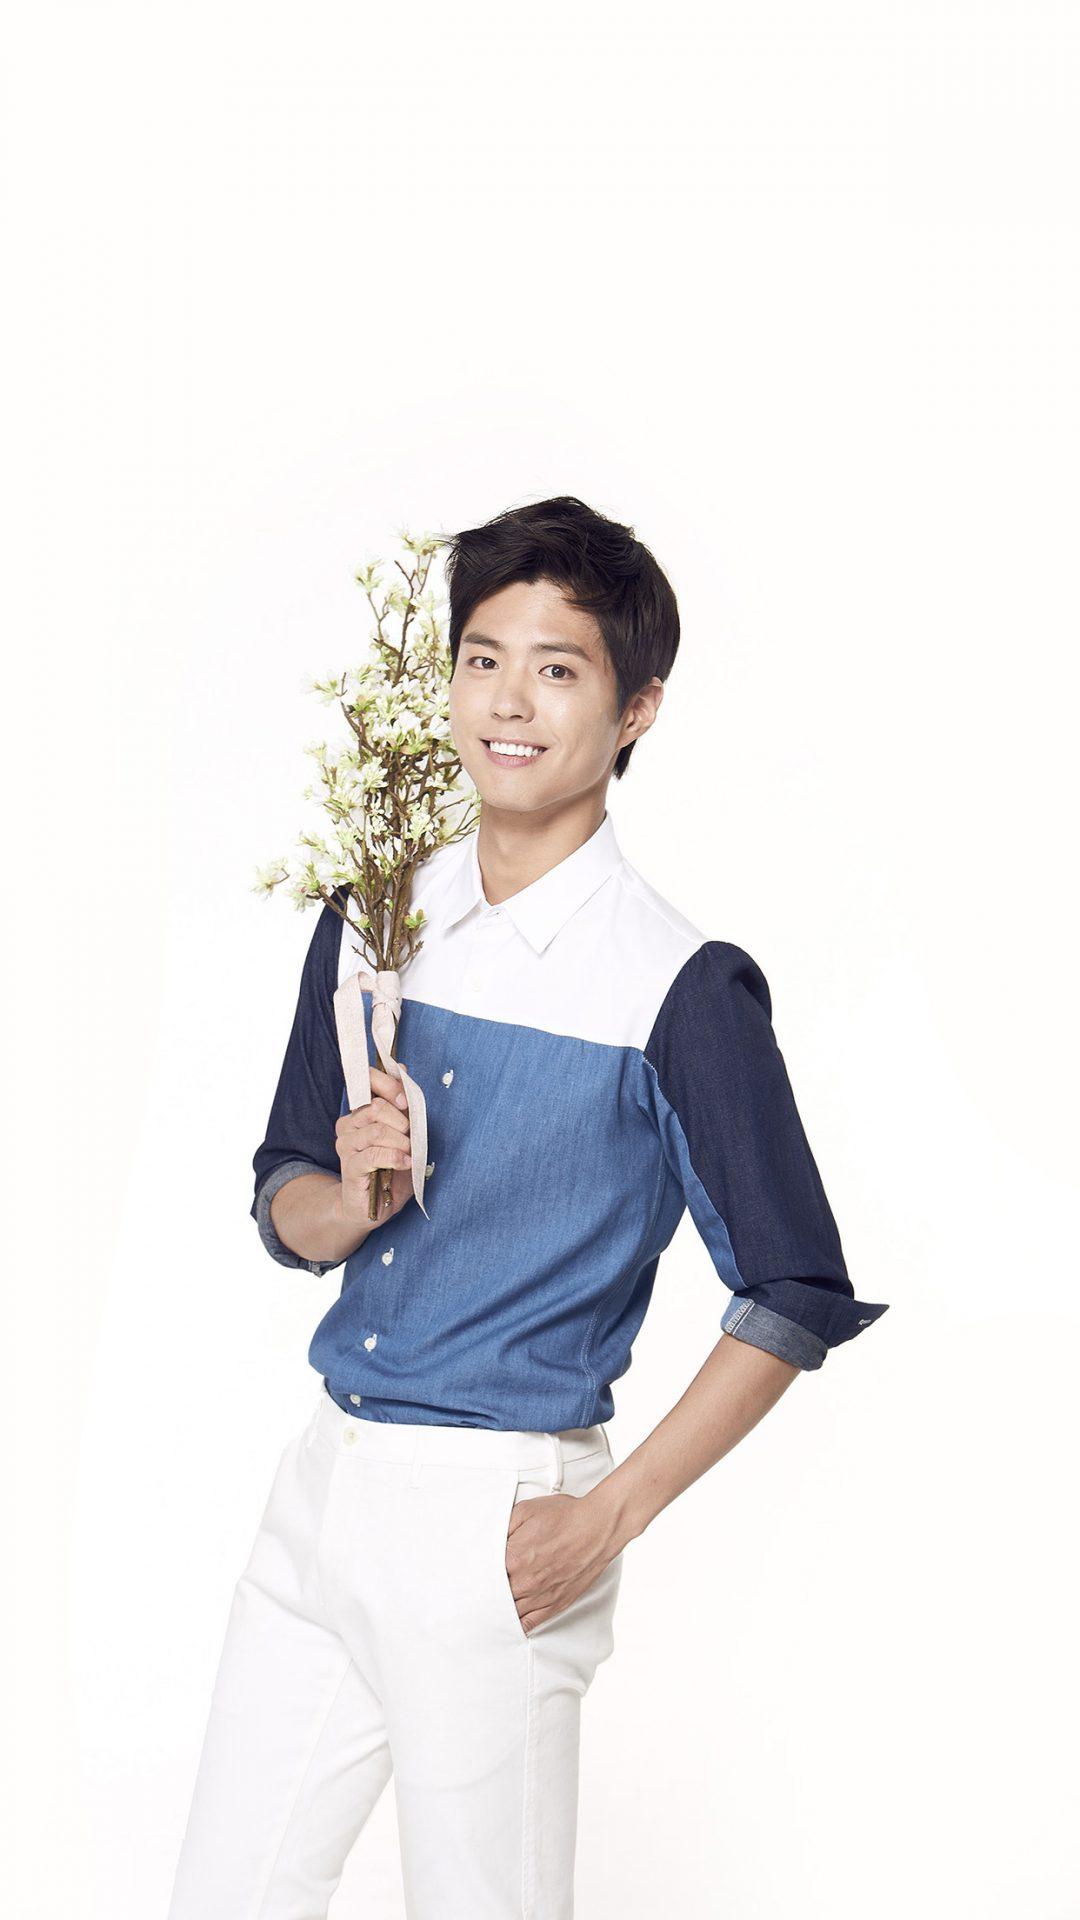 Bogum Kpop Boy Flower Smile Asian